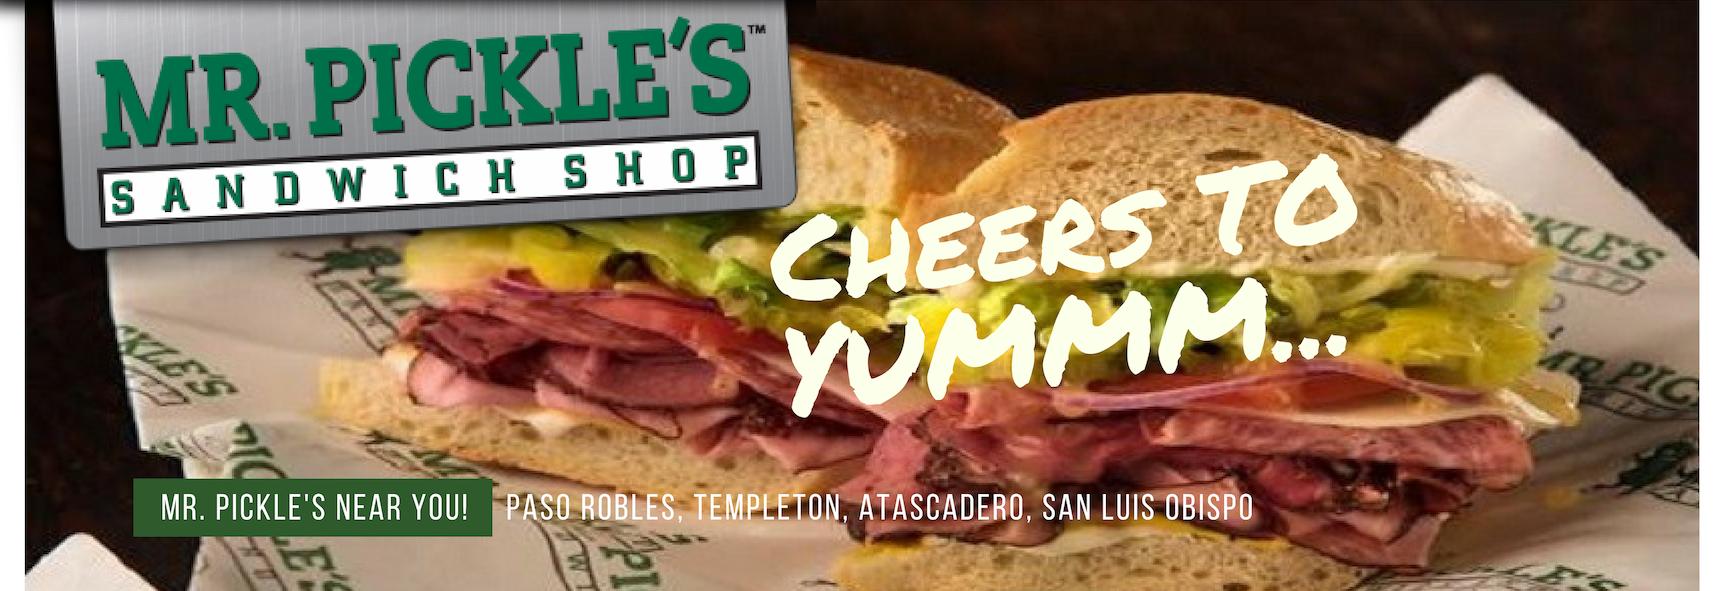 Mr. Pickle's Sandwich Shop in San Luis Obispo, CA banner